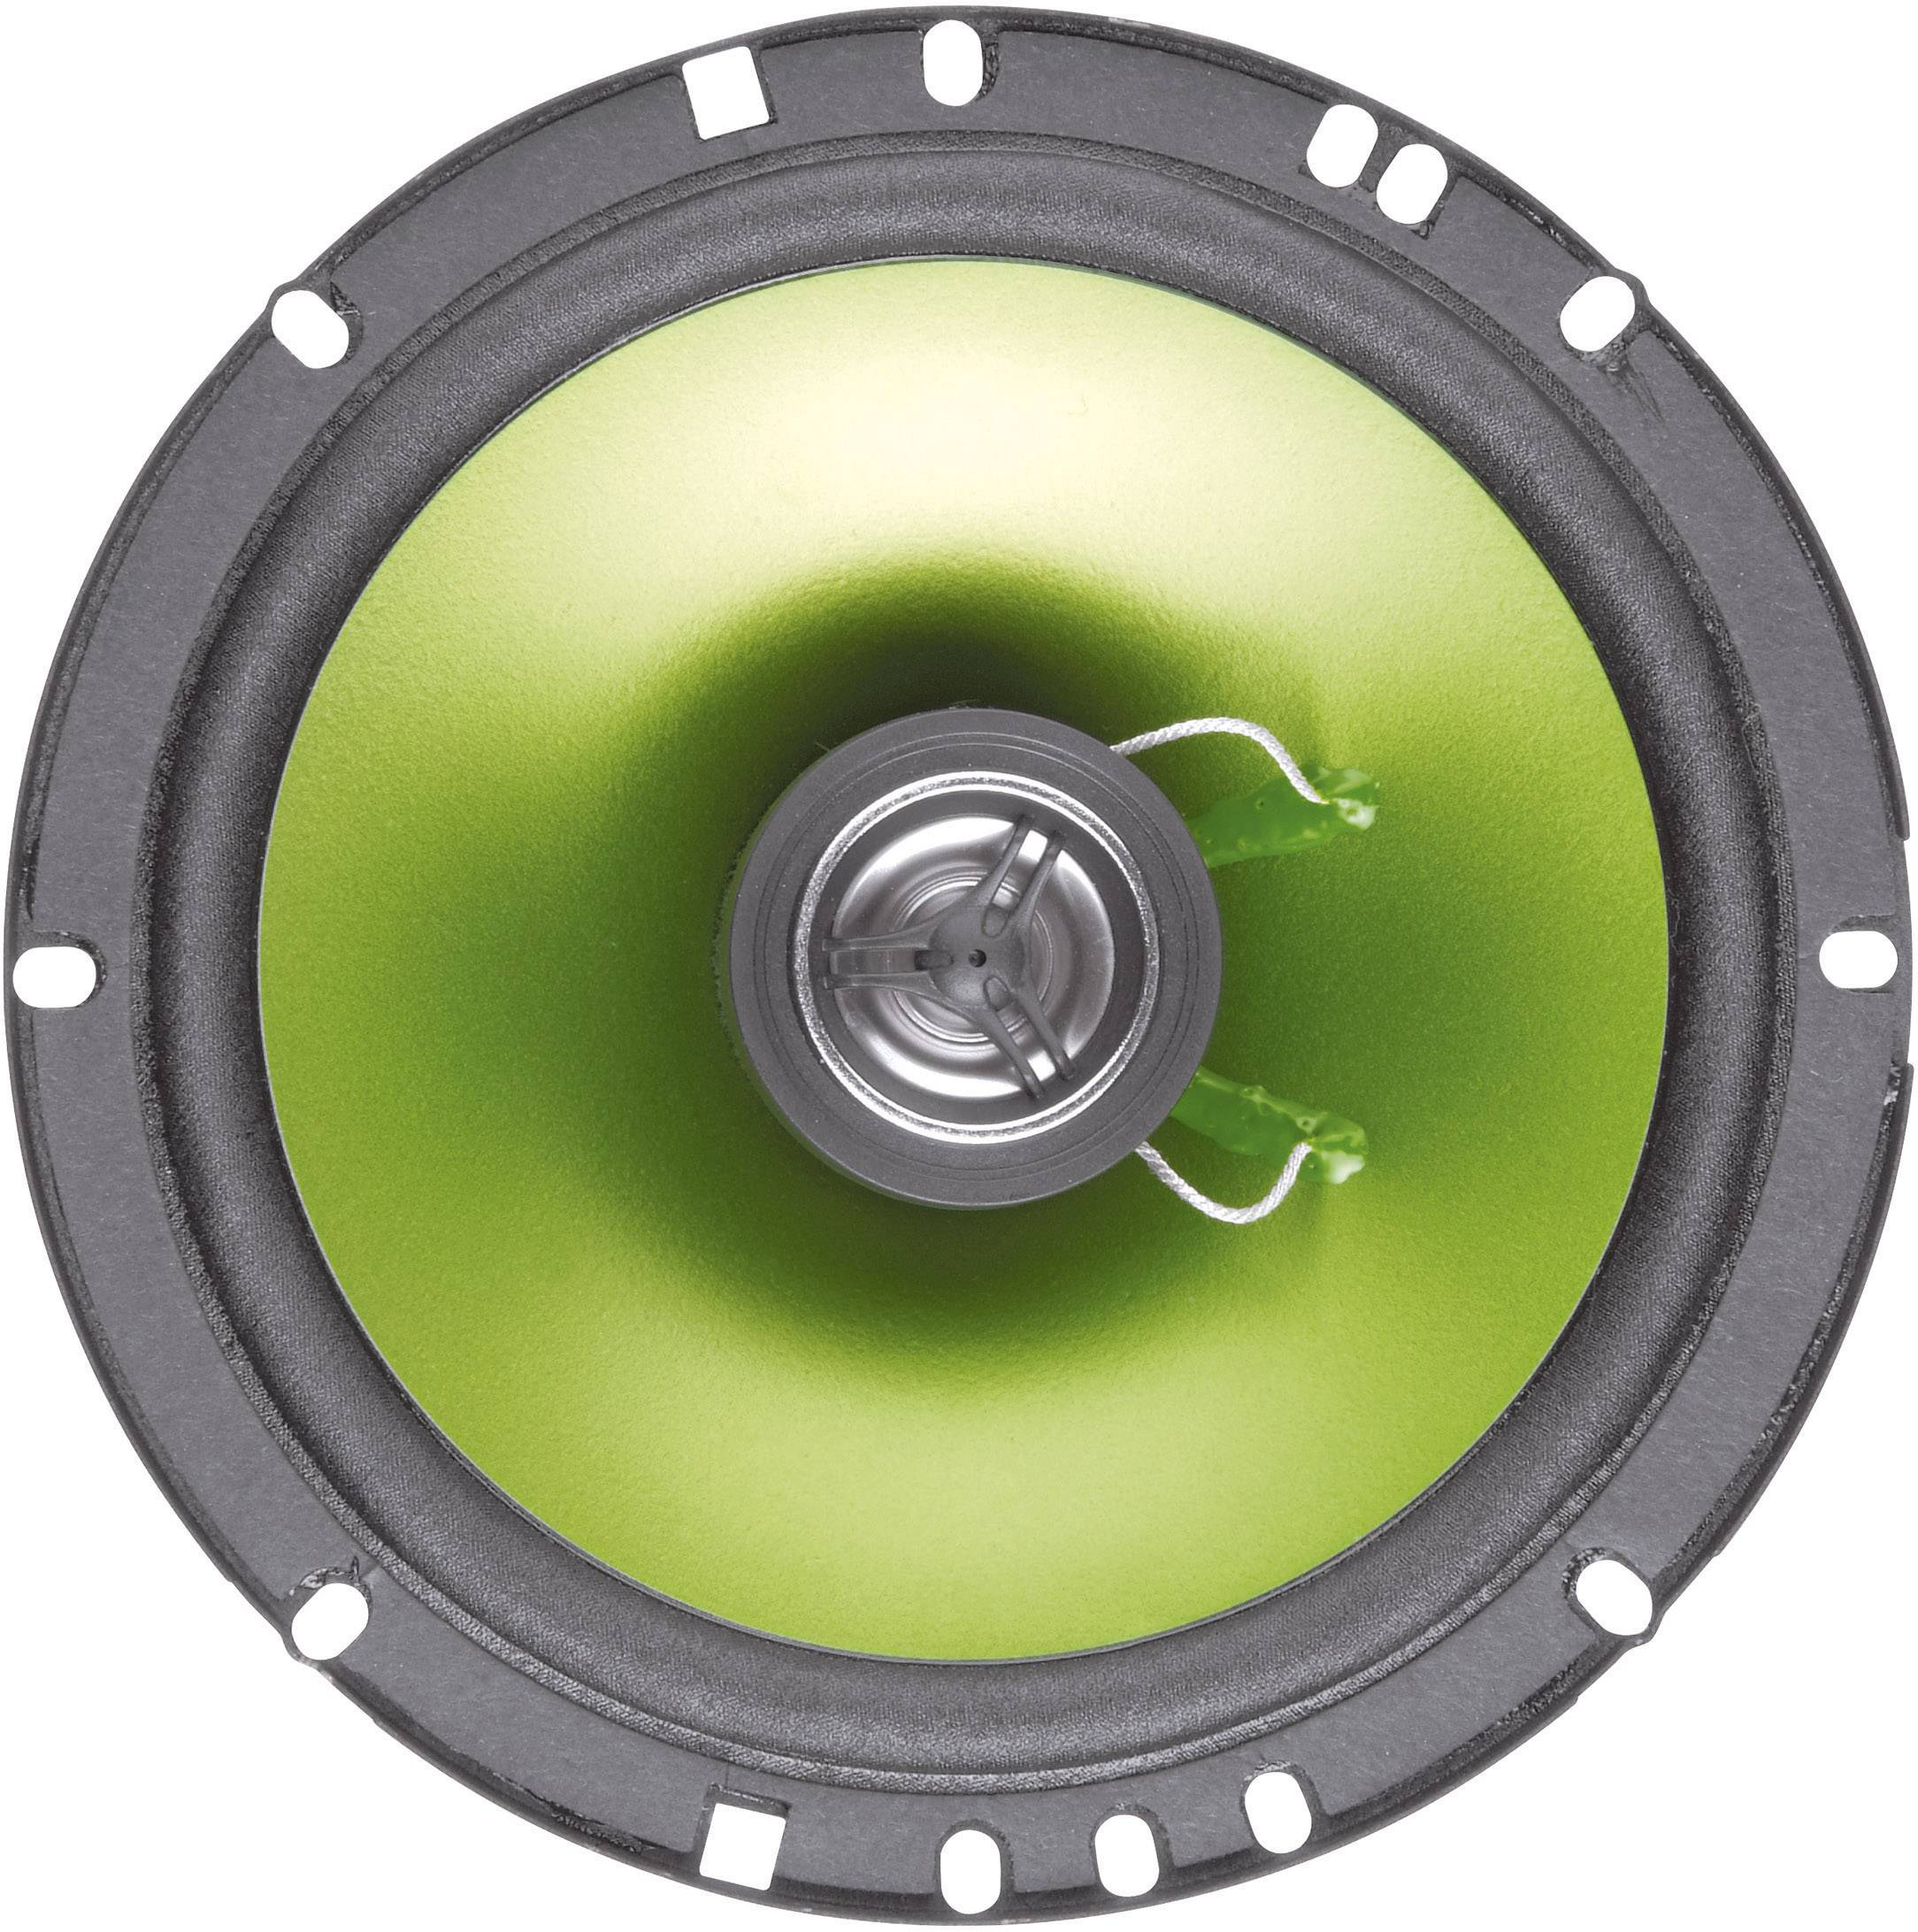 Hi-Fi súprava do auta Raveland Green Force II, 4 x 250 W